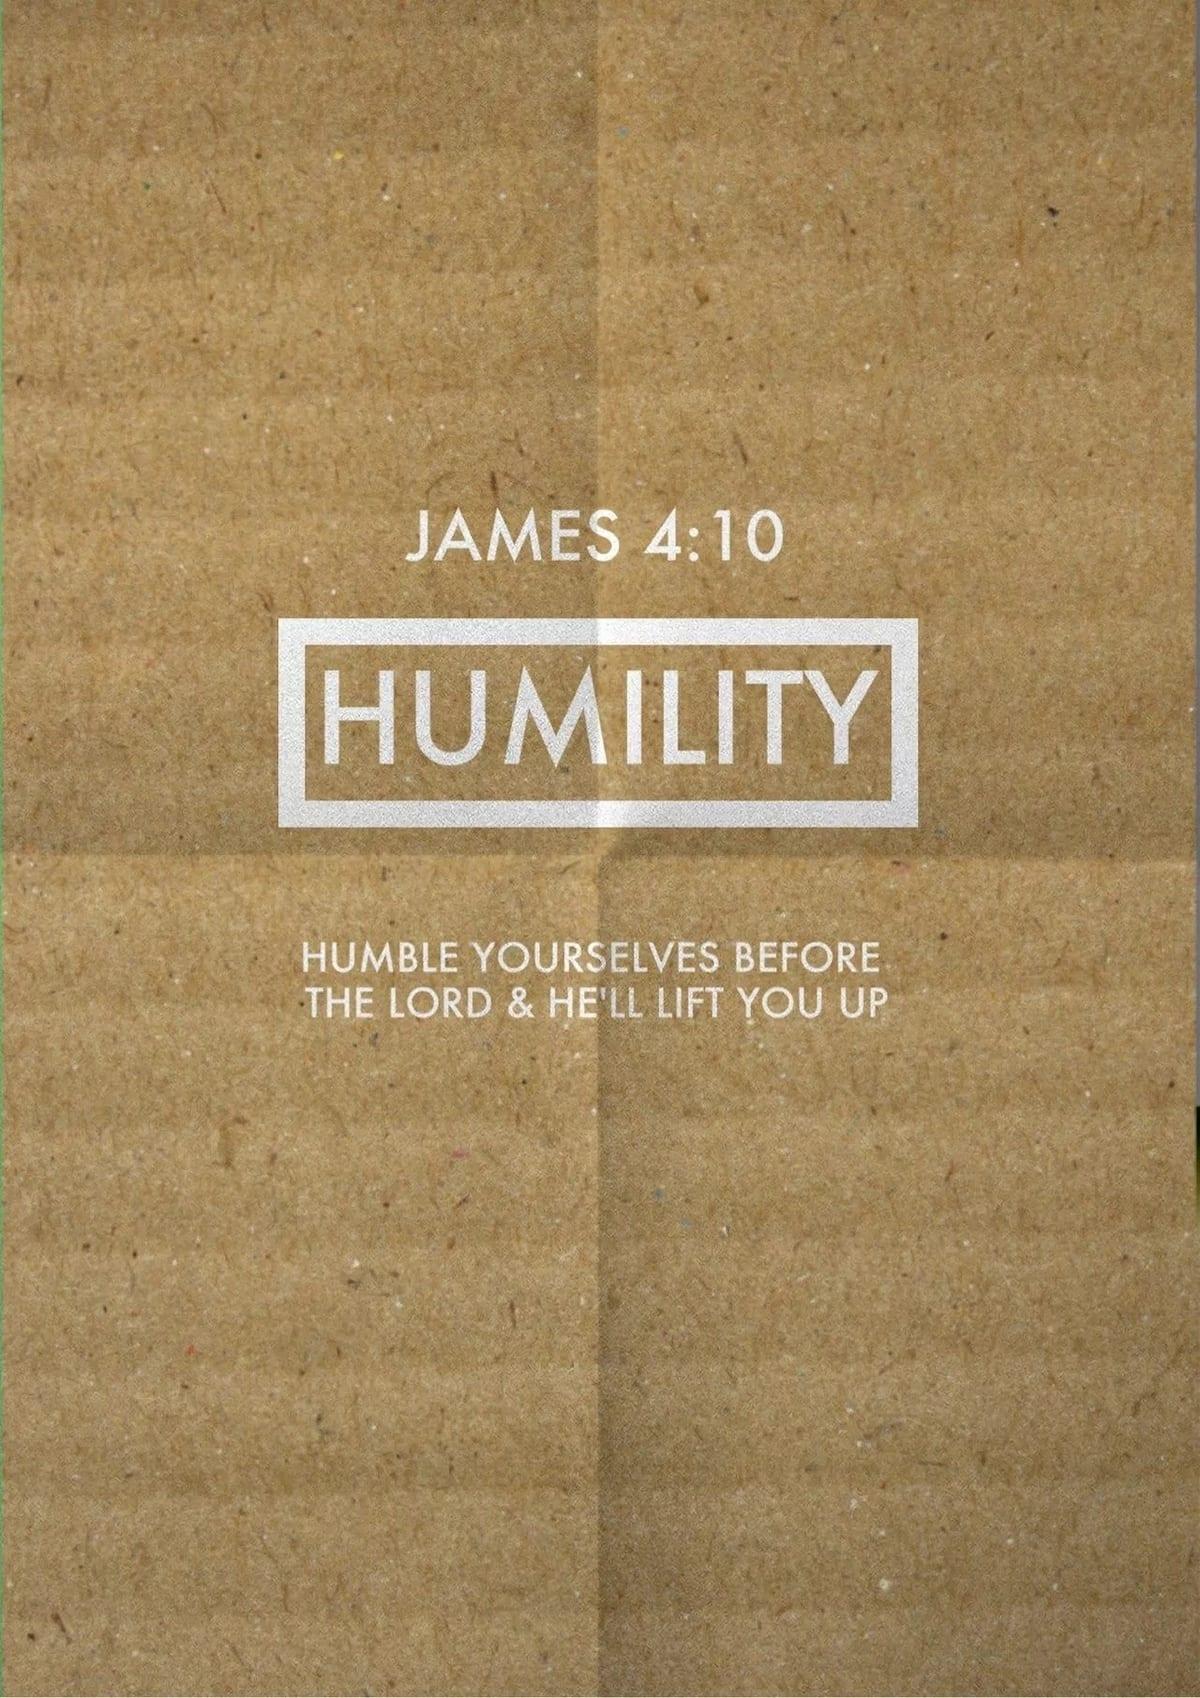 Humility quotes, Quotes on humility, Humility bible quotes